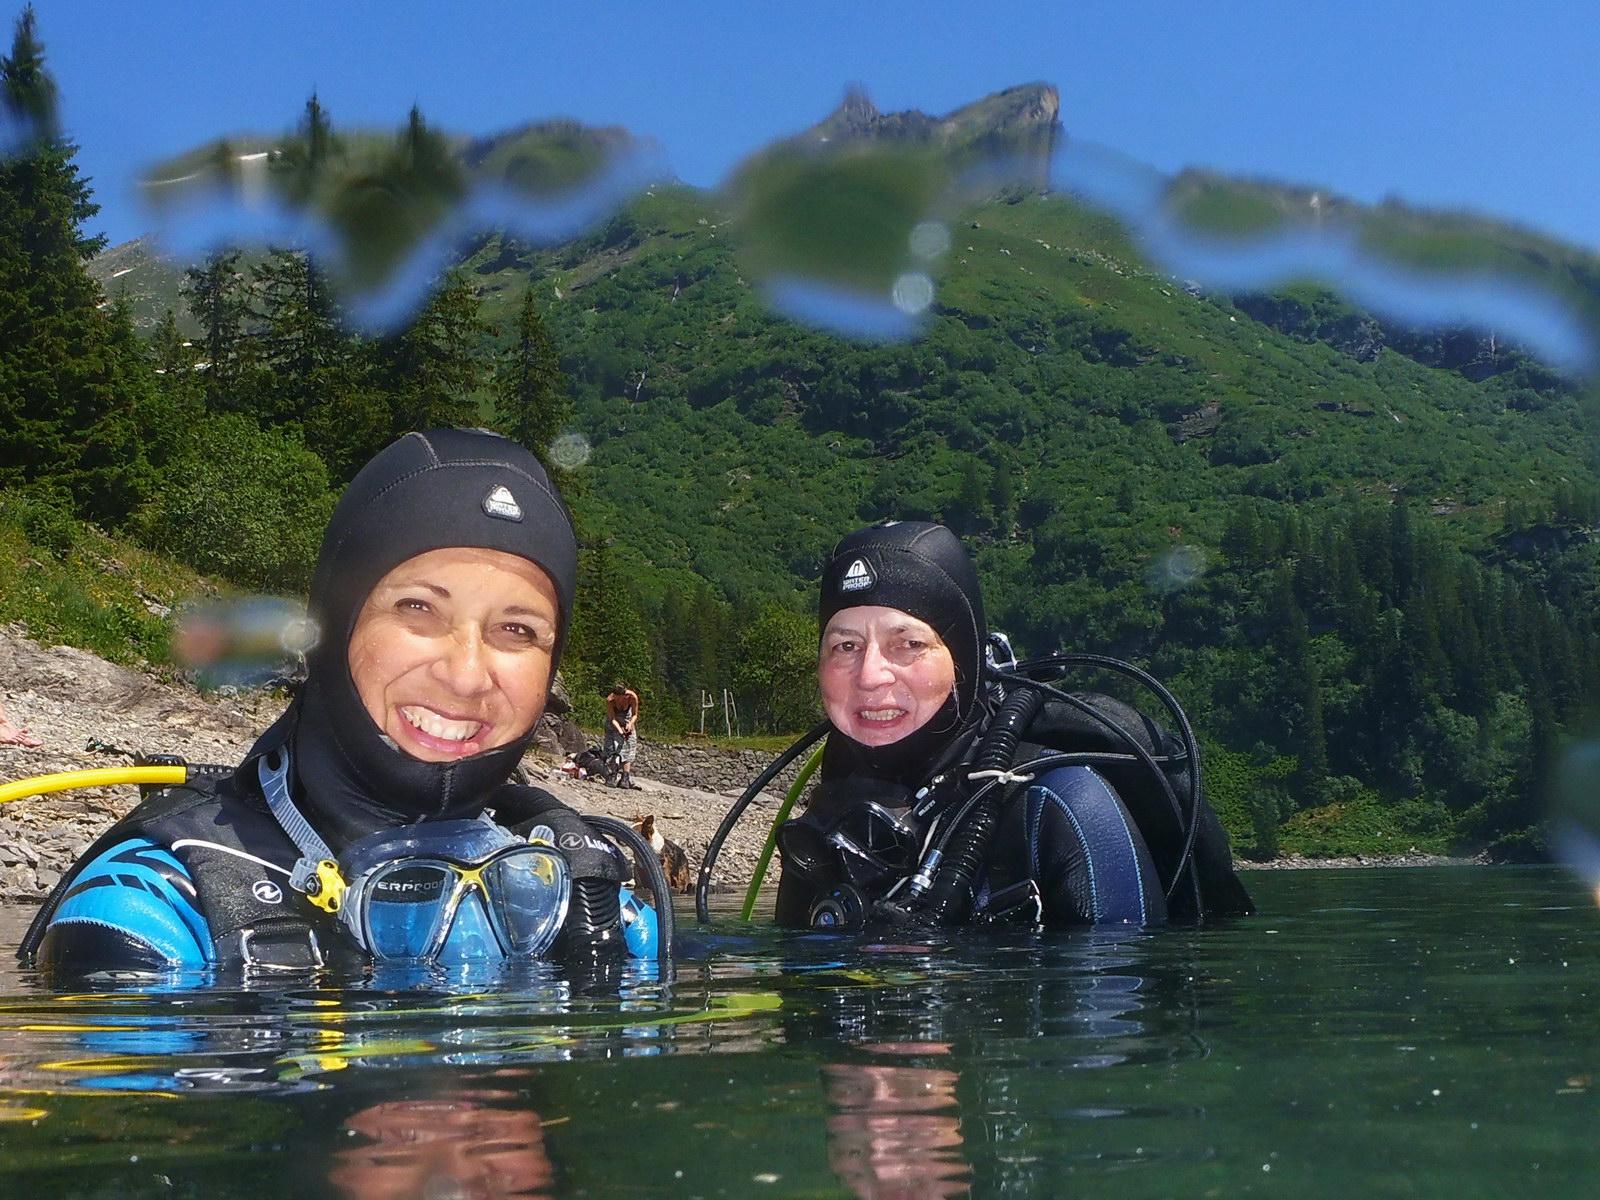 Begeisterte Bergsee Taucherinnen